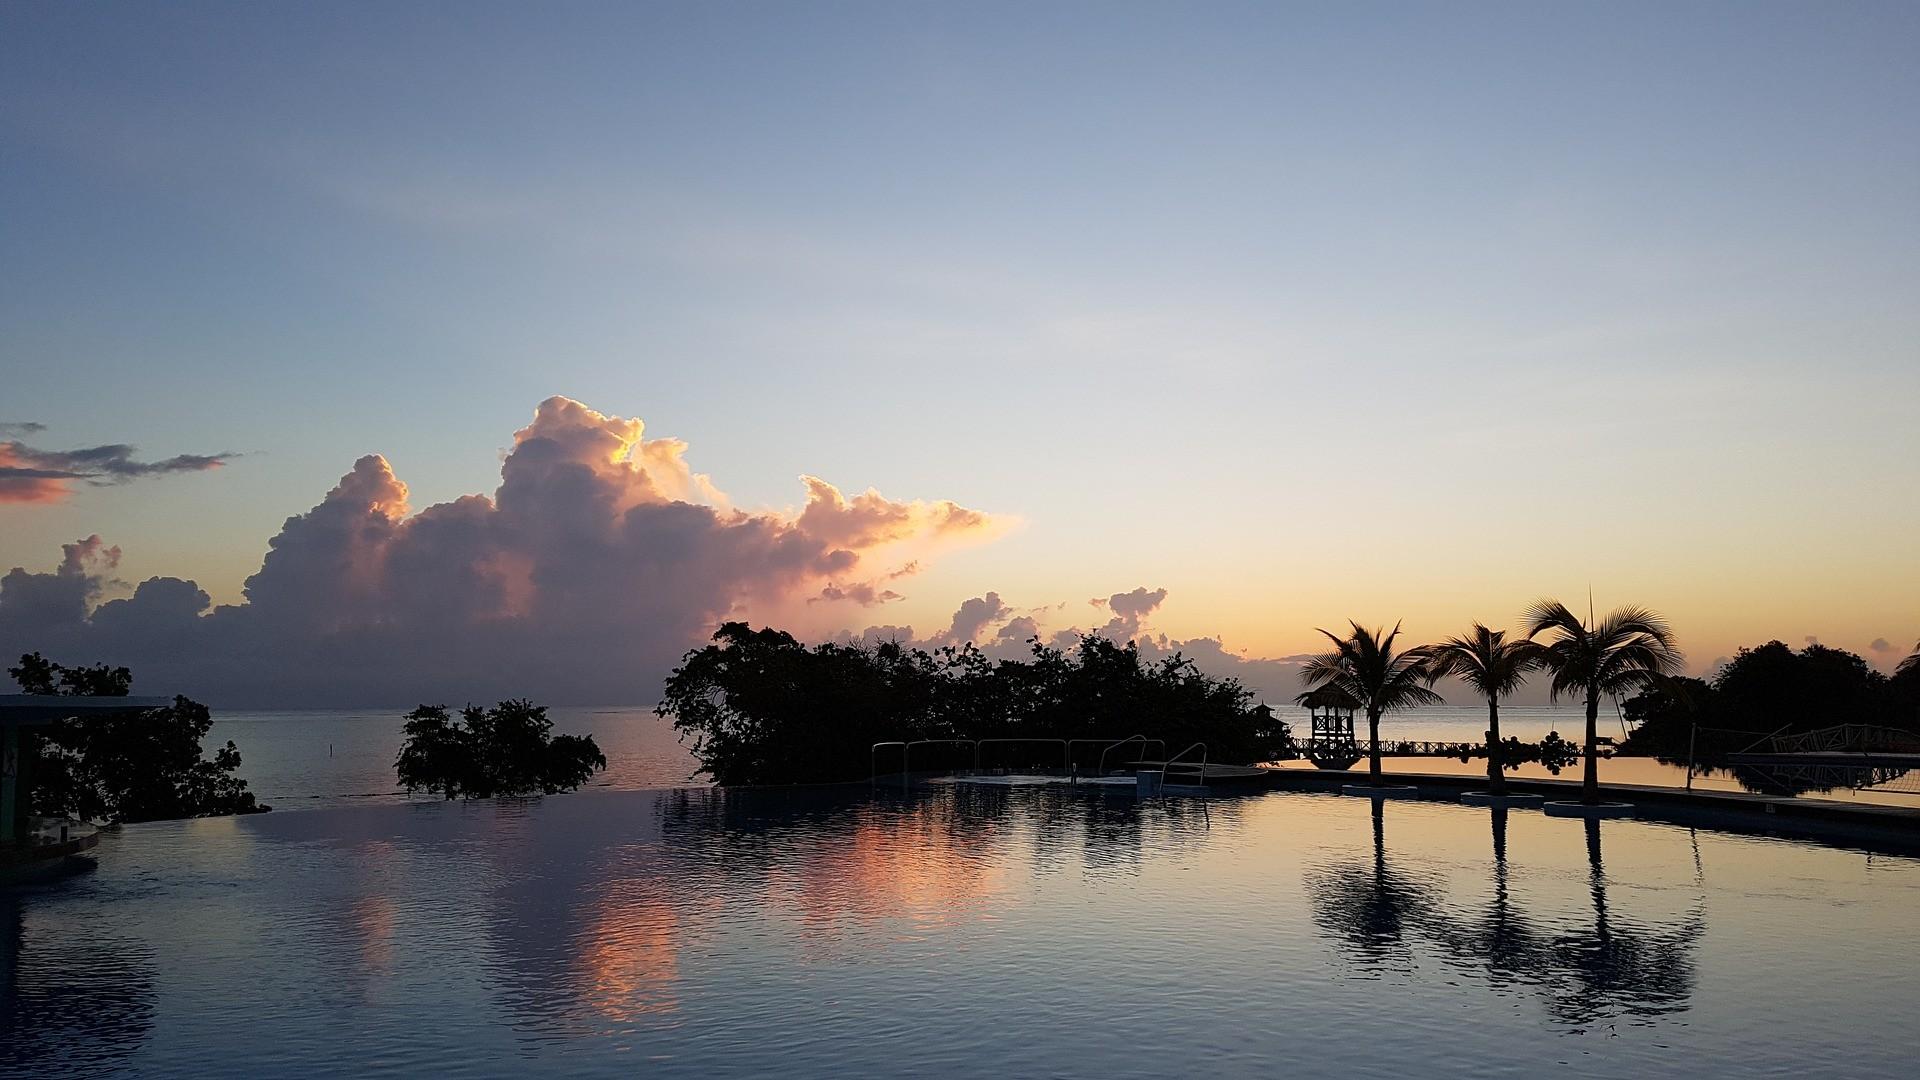 news-main-jamaica-seeks-to-rekindle-the-romance-with-new-honeymoon-promotion.1616595454.jpg